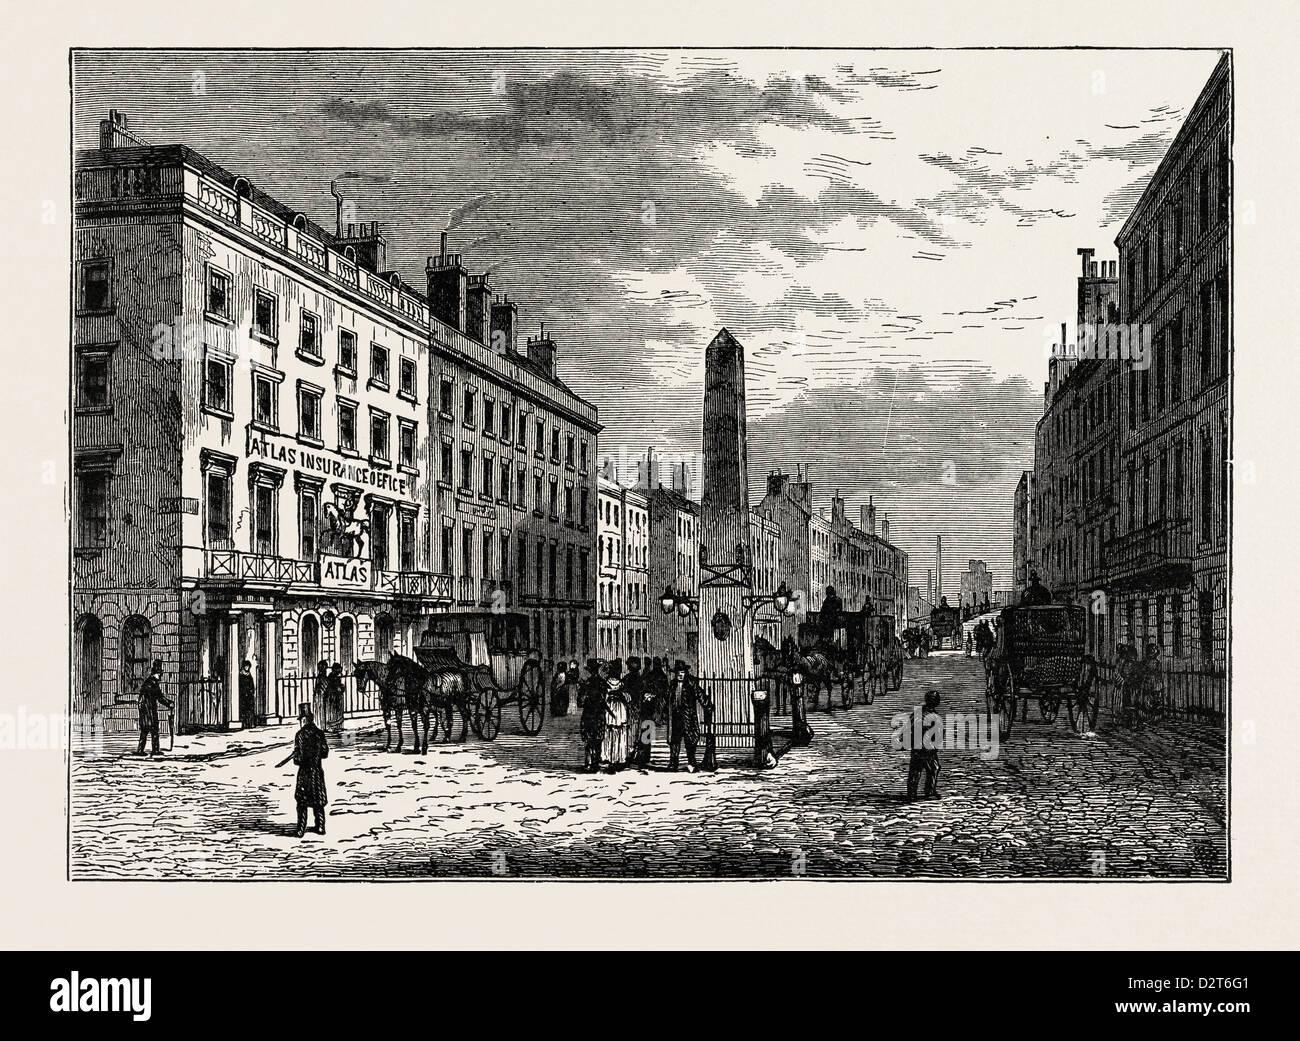 NEW BRIDGE STREET AND THE OBELISK IN 1795 LONDON - Stock Image